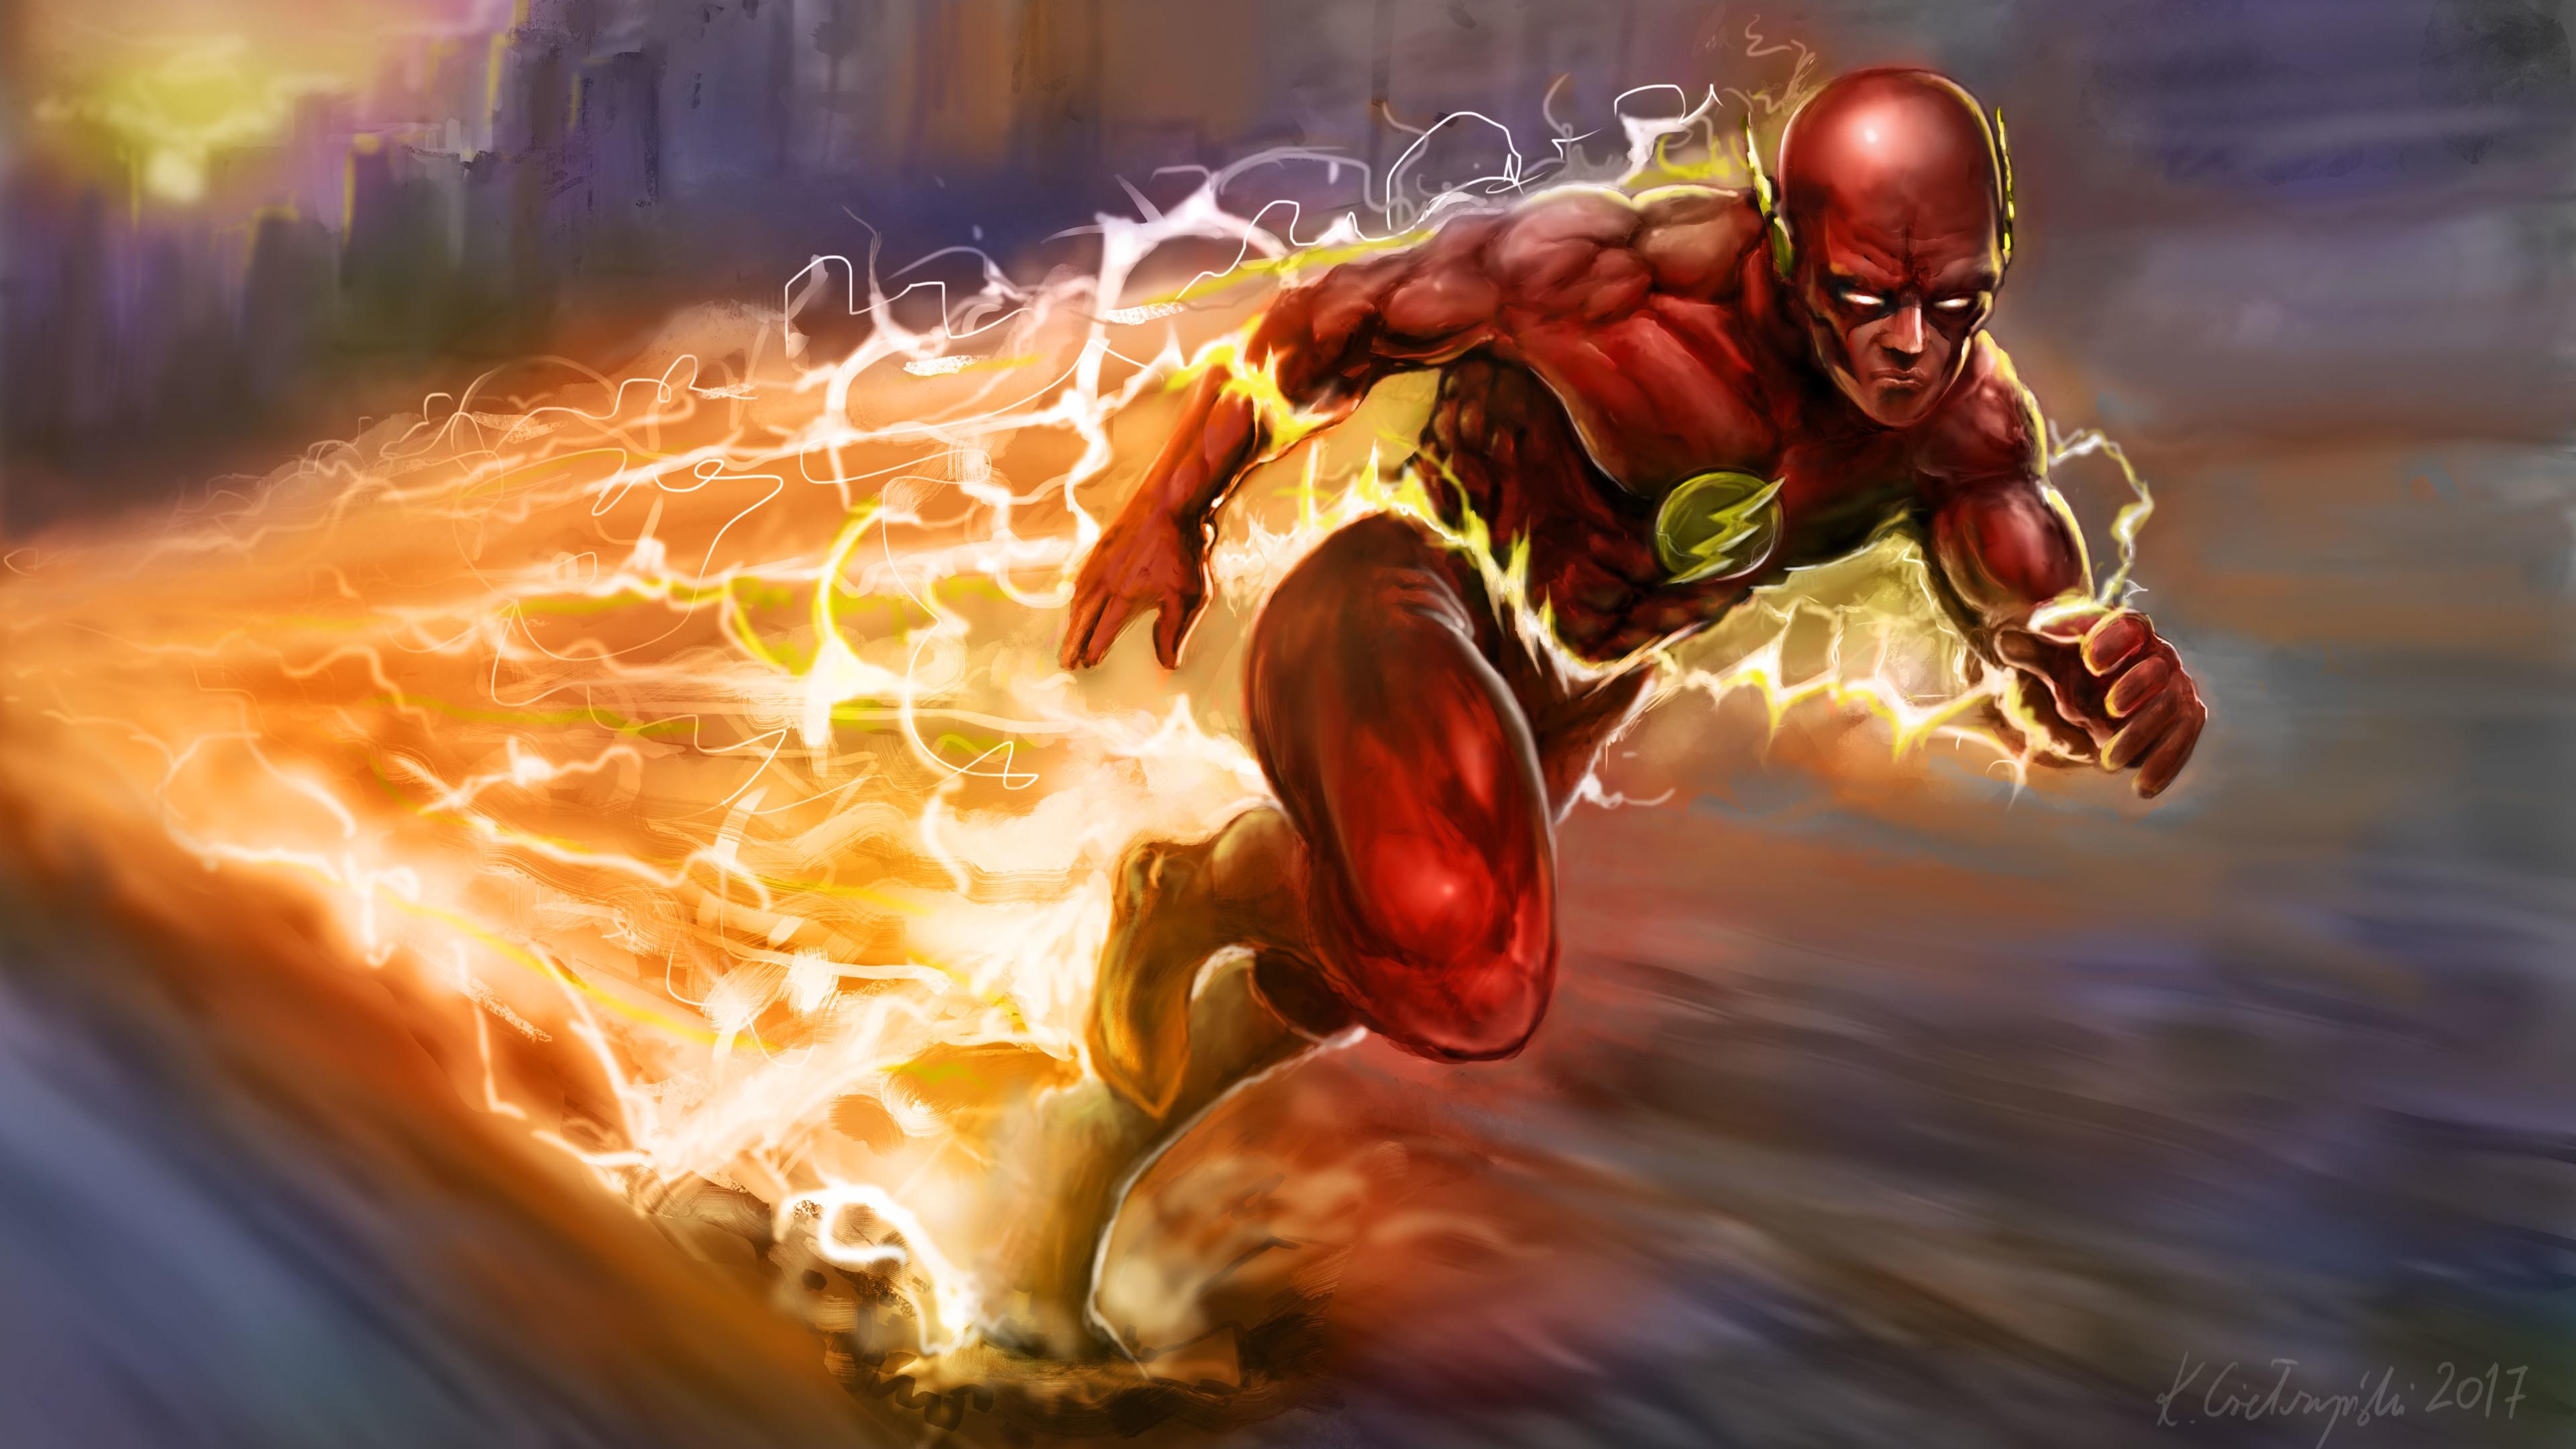 the flash running artwork 4k 1540756232 - The Flash Running Artwork 4k - superheroes wallpapers, hd-wallpapers, flash wallpapers, digital art wallpapers, deviantart wallpapers, artwork wallpapers, artist wallpapers, 4k-wallpapers